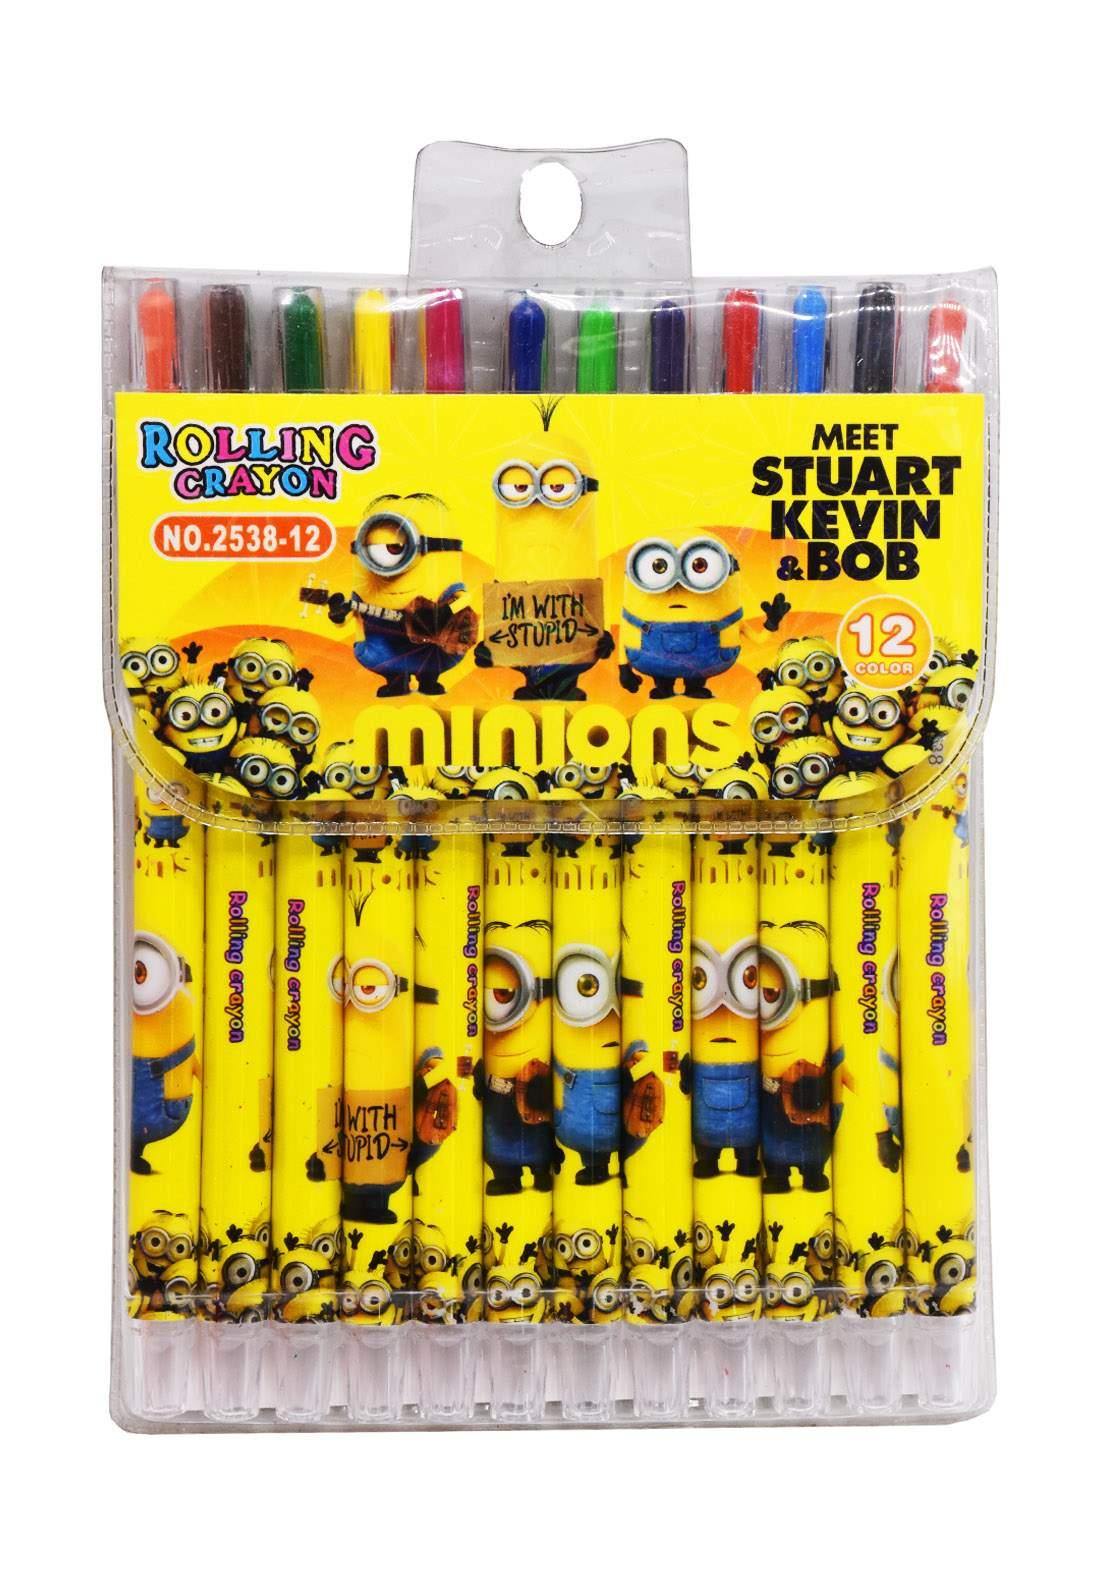 Rolling Crayon Pastel Colors 12Pcs الوان باستيل